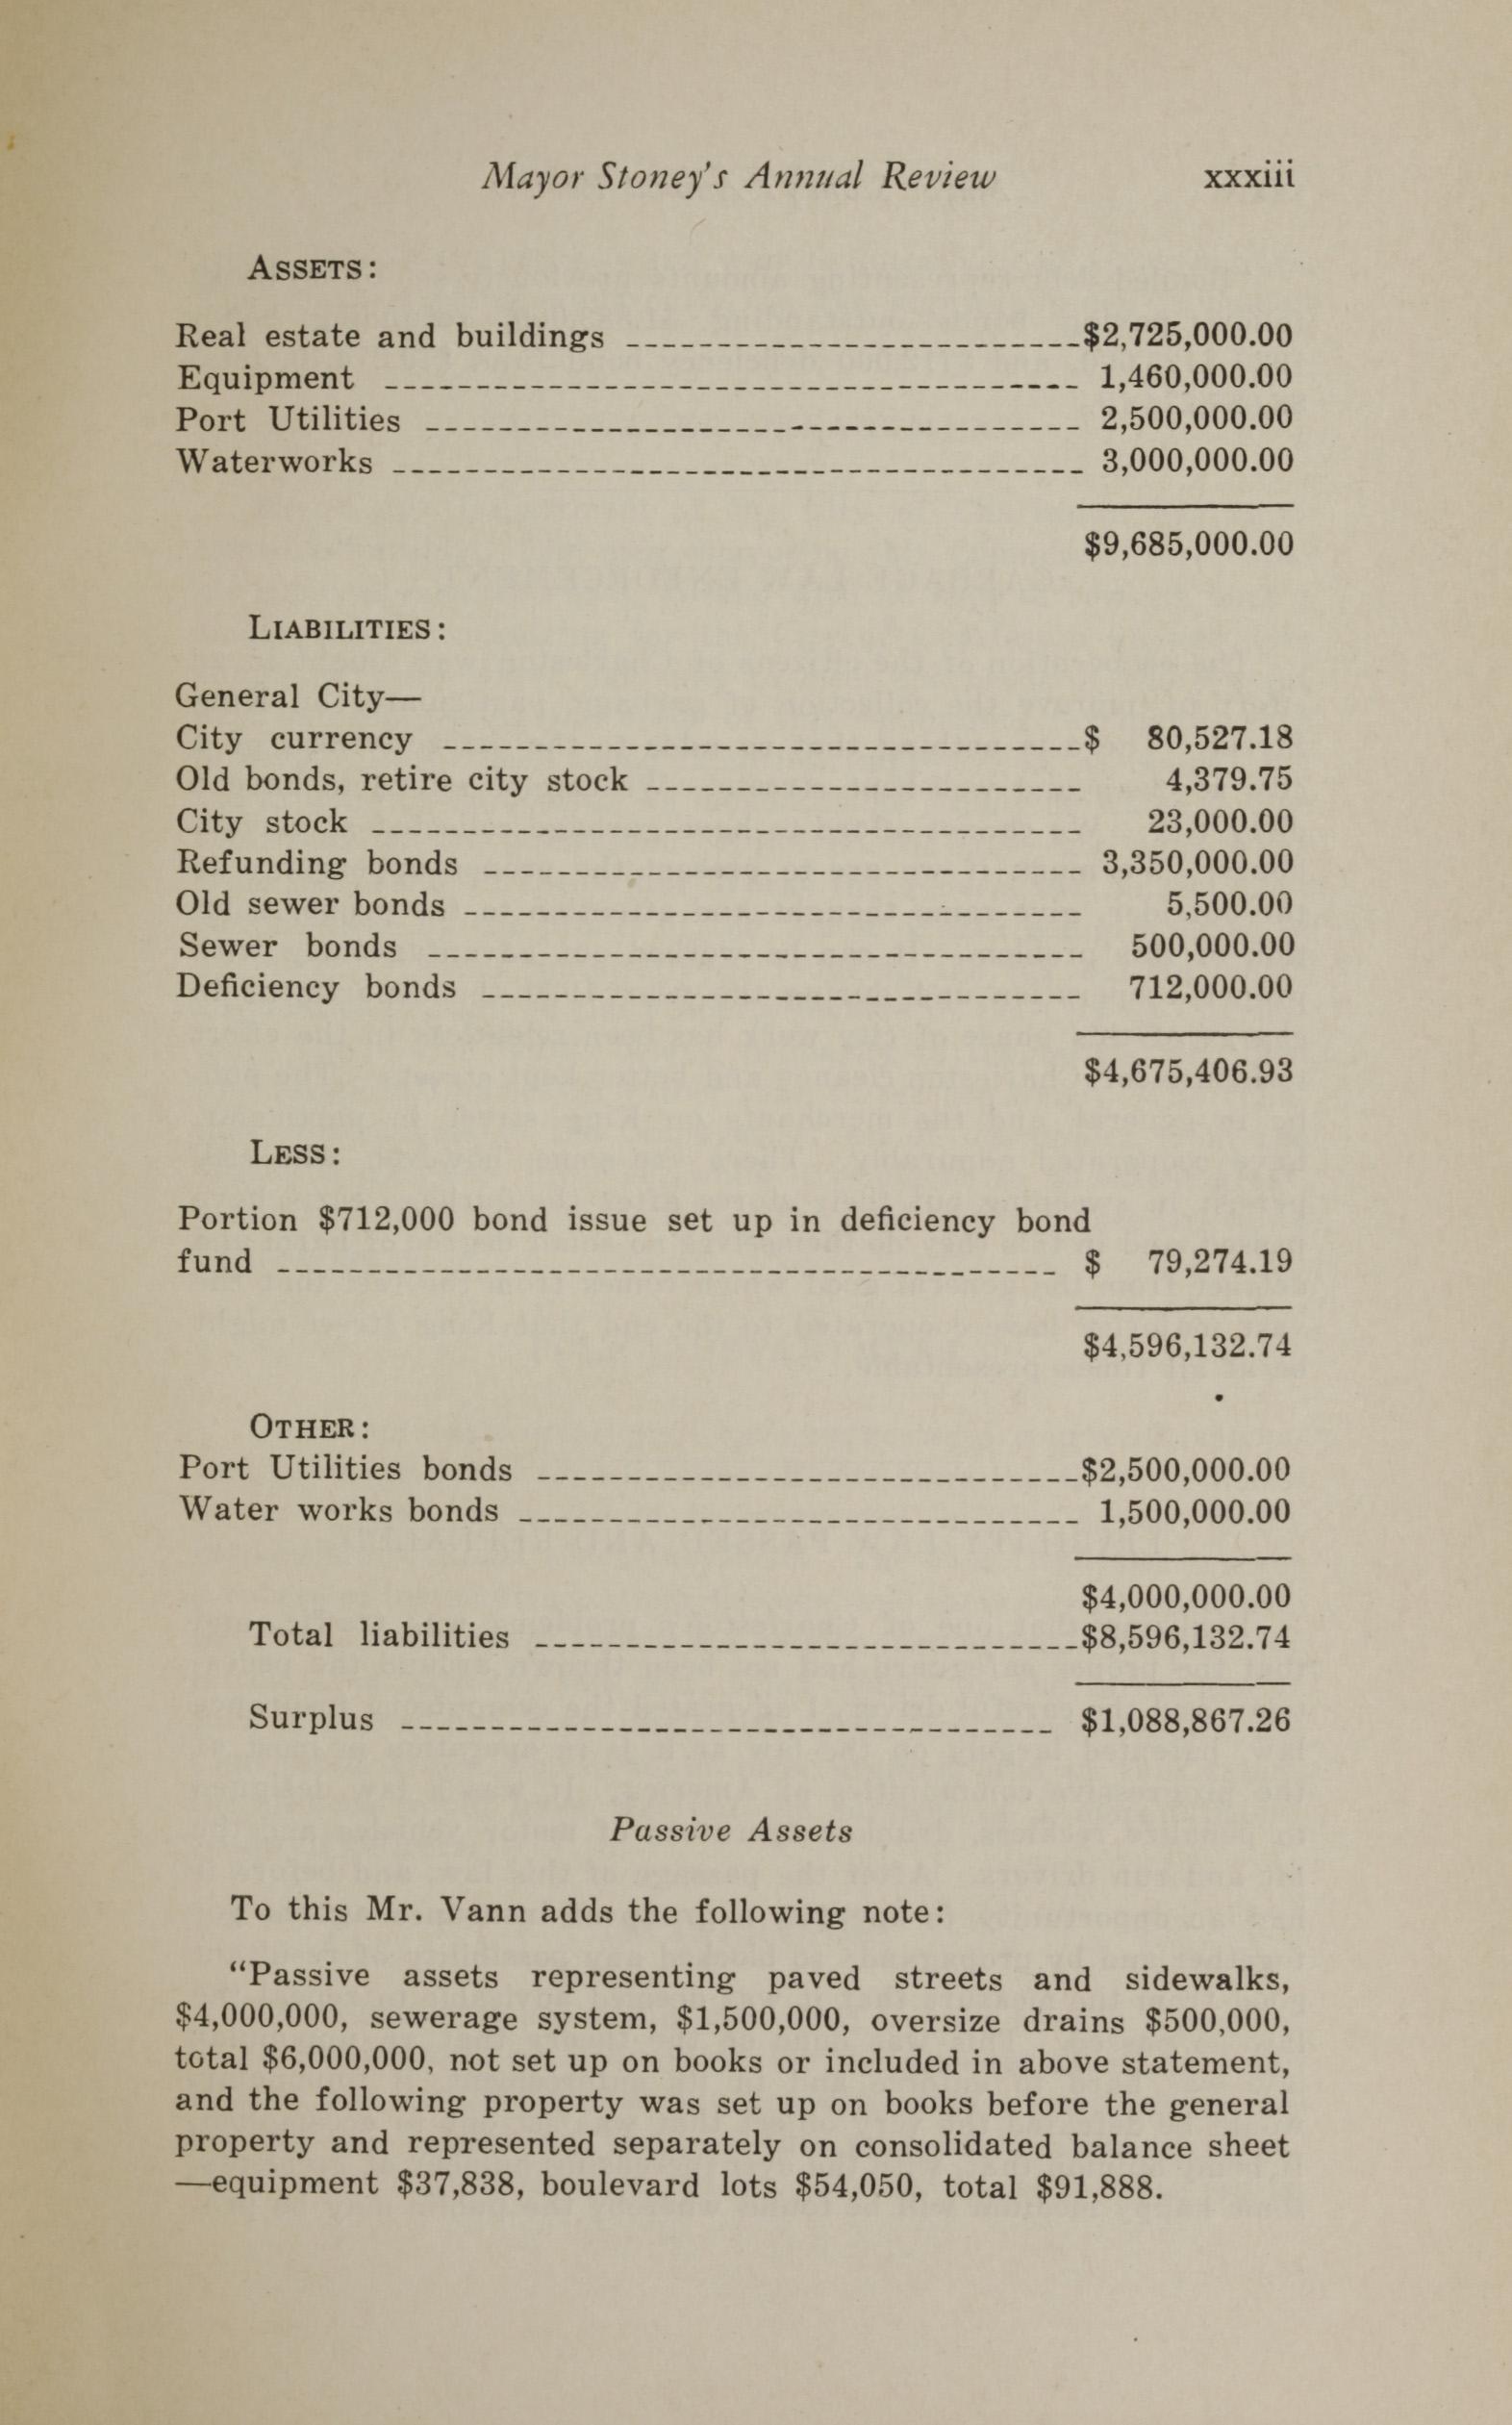 Charleston Yearbook, 1930, page xxxiii